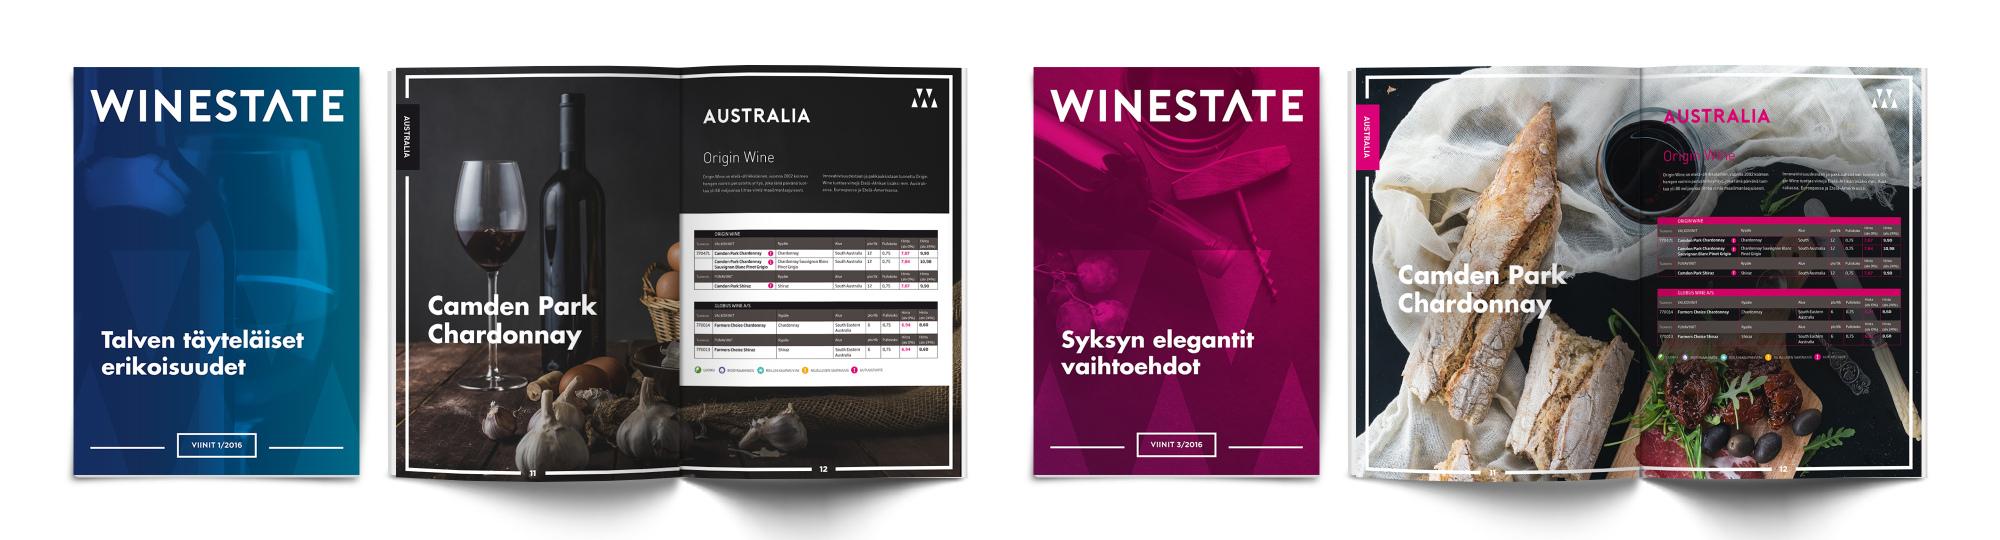 bm_winestate16